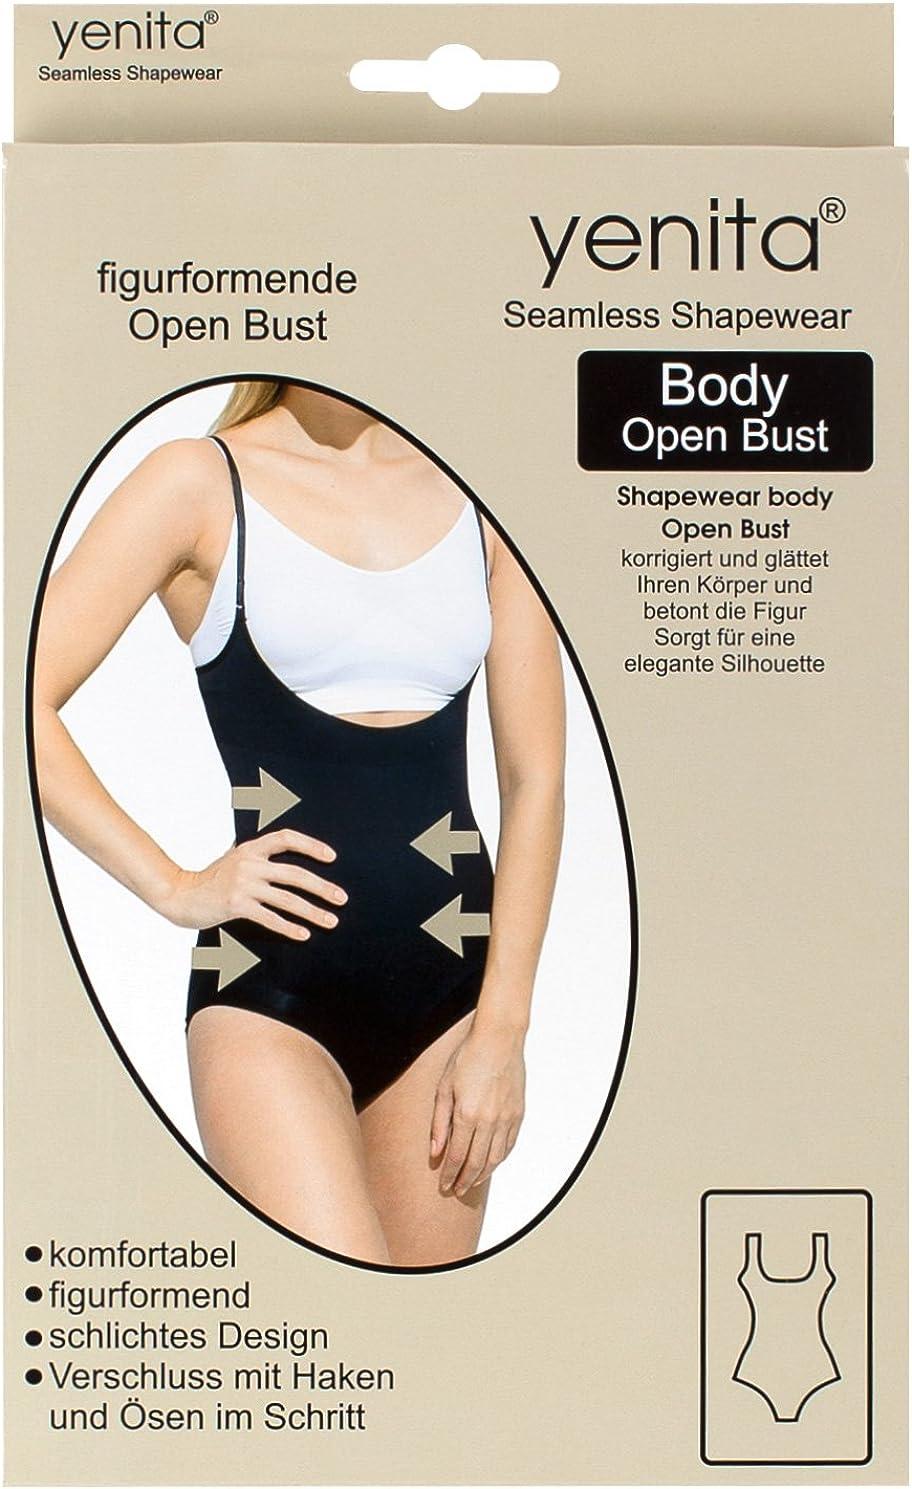 Yenita Womens Bodyshaper Open Bust Bodysuit with Straps Slimming Body Underbust